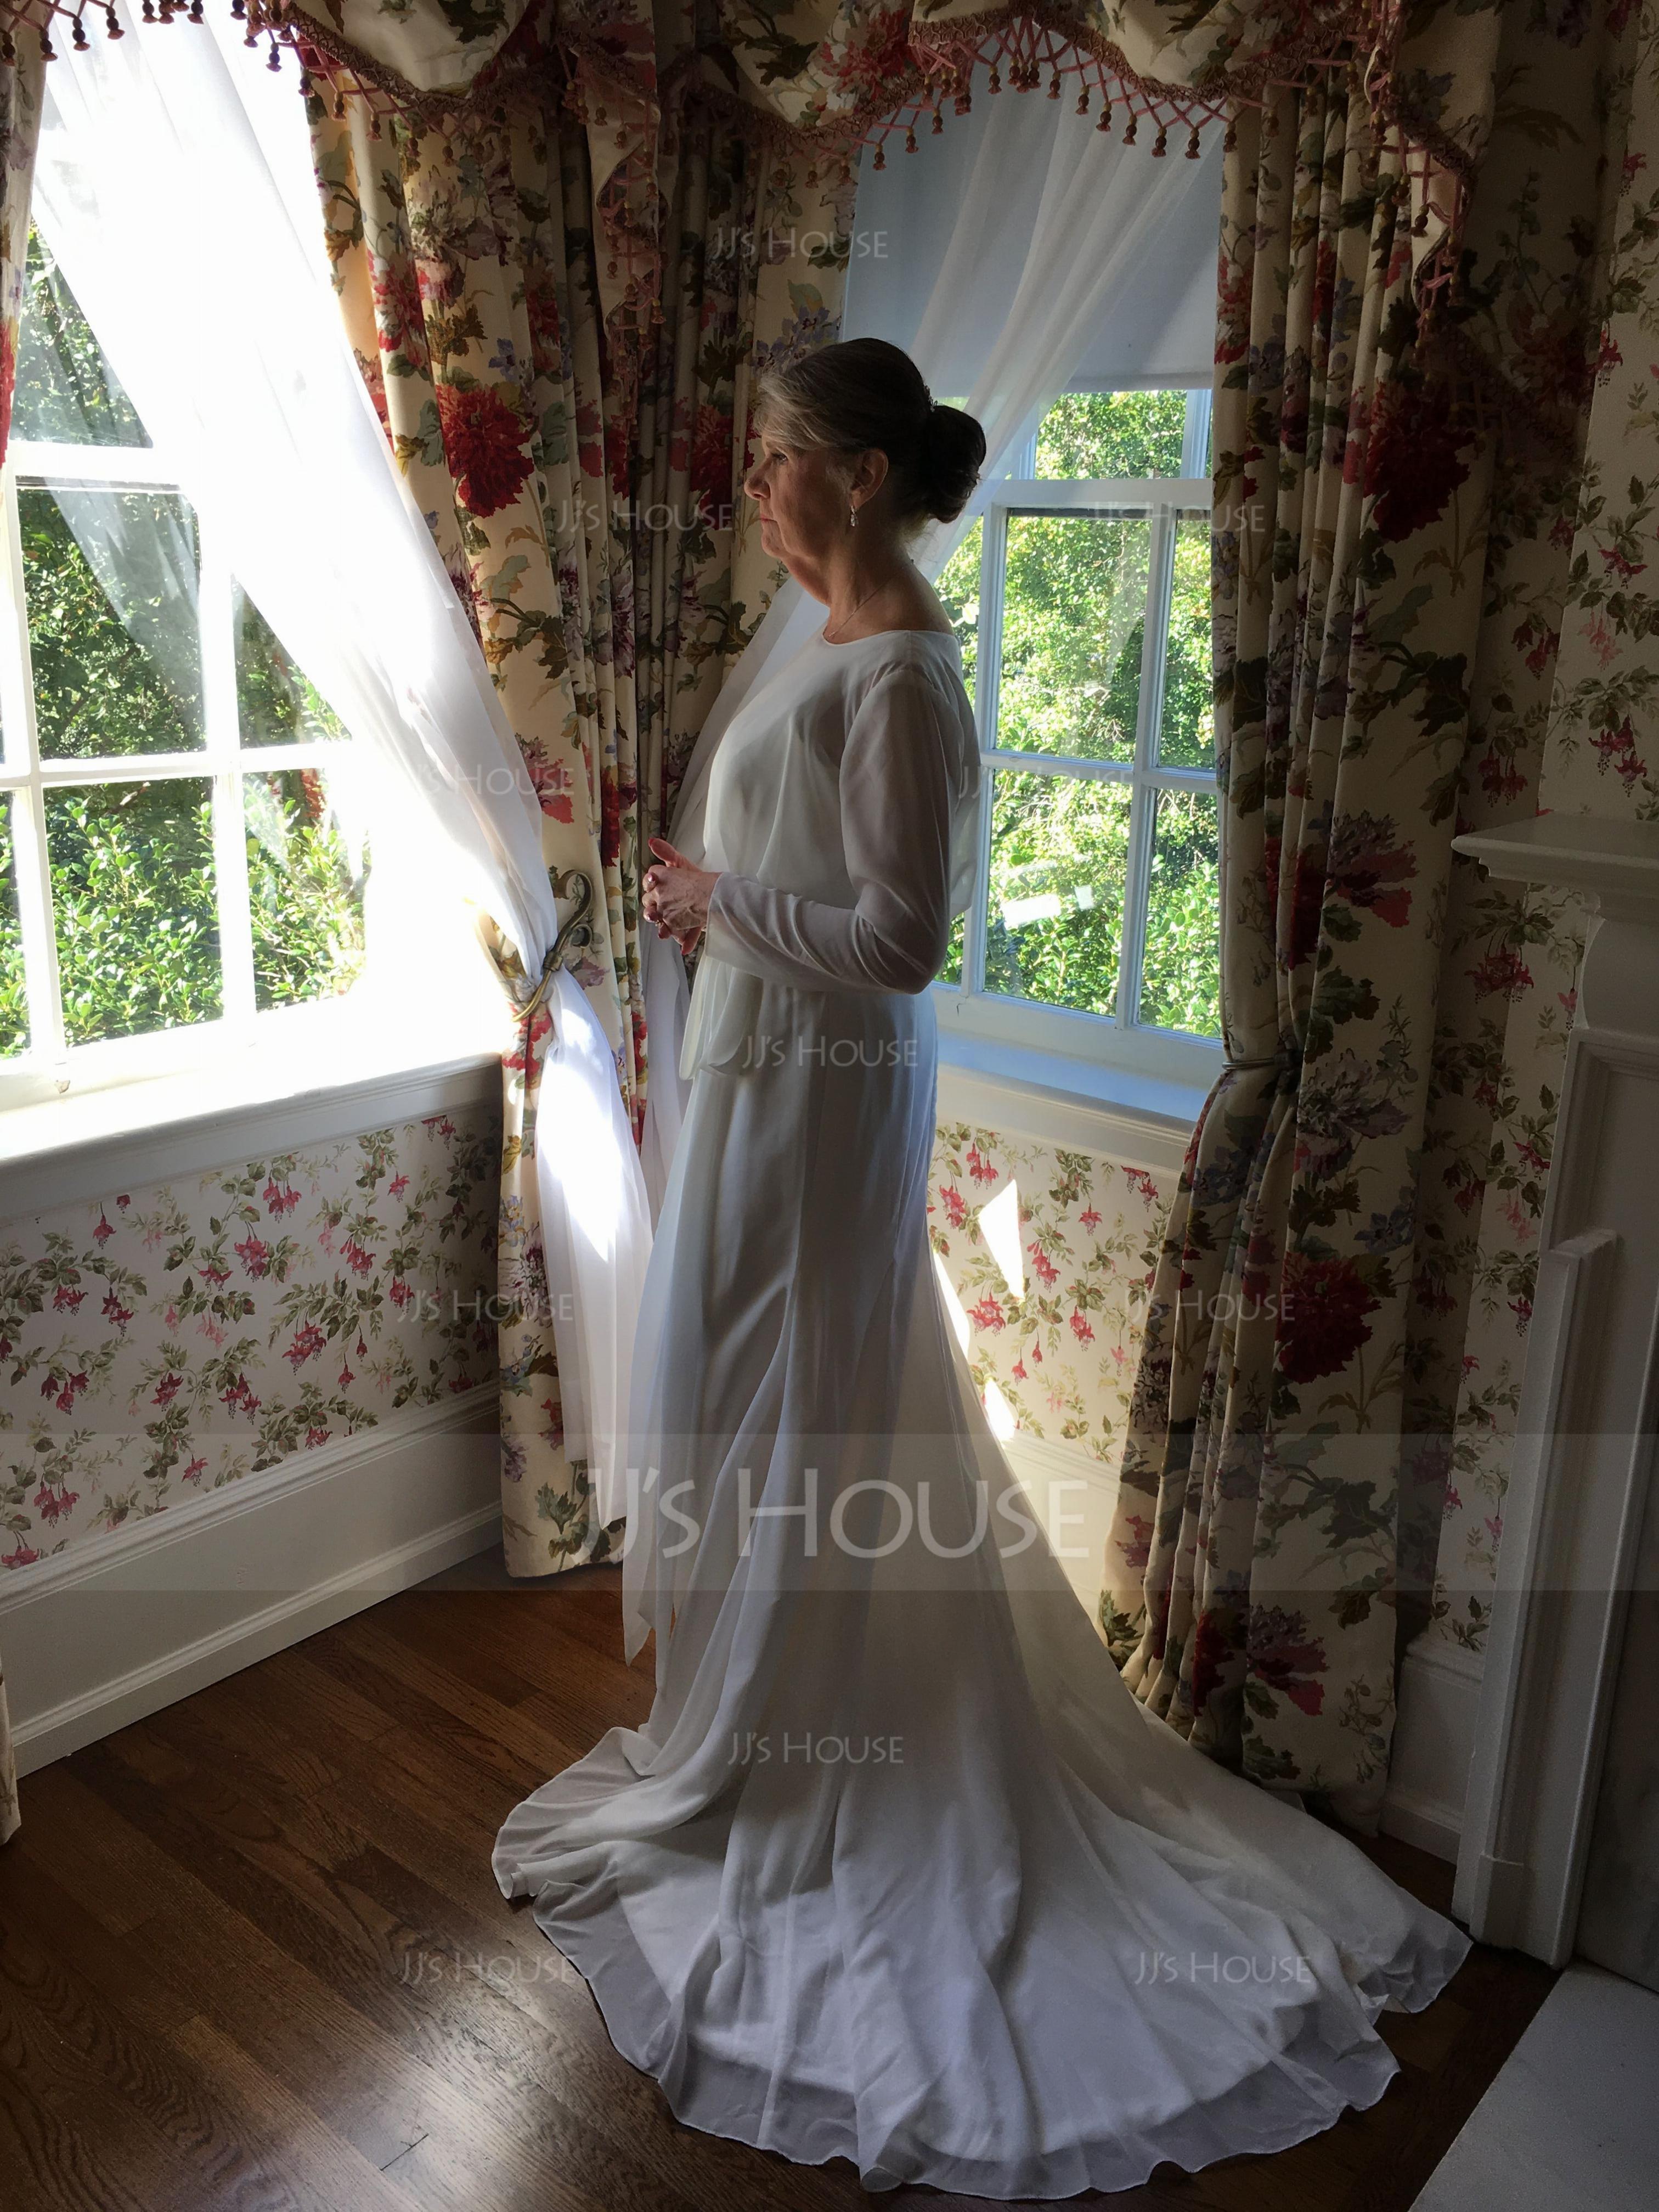 Sheath/Column Scoop Neck Court Train Chiffon Wedding Dress With Ruffle Bow(s) (002076025)